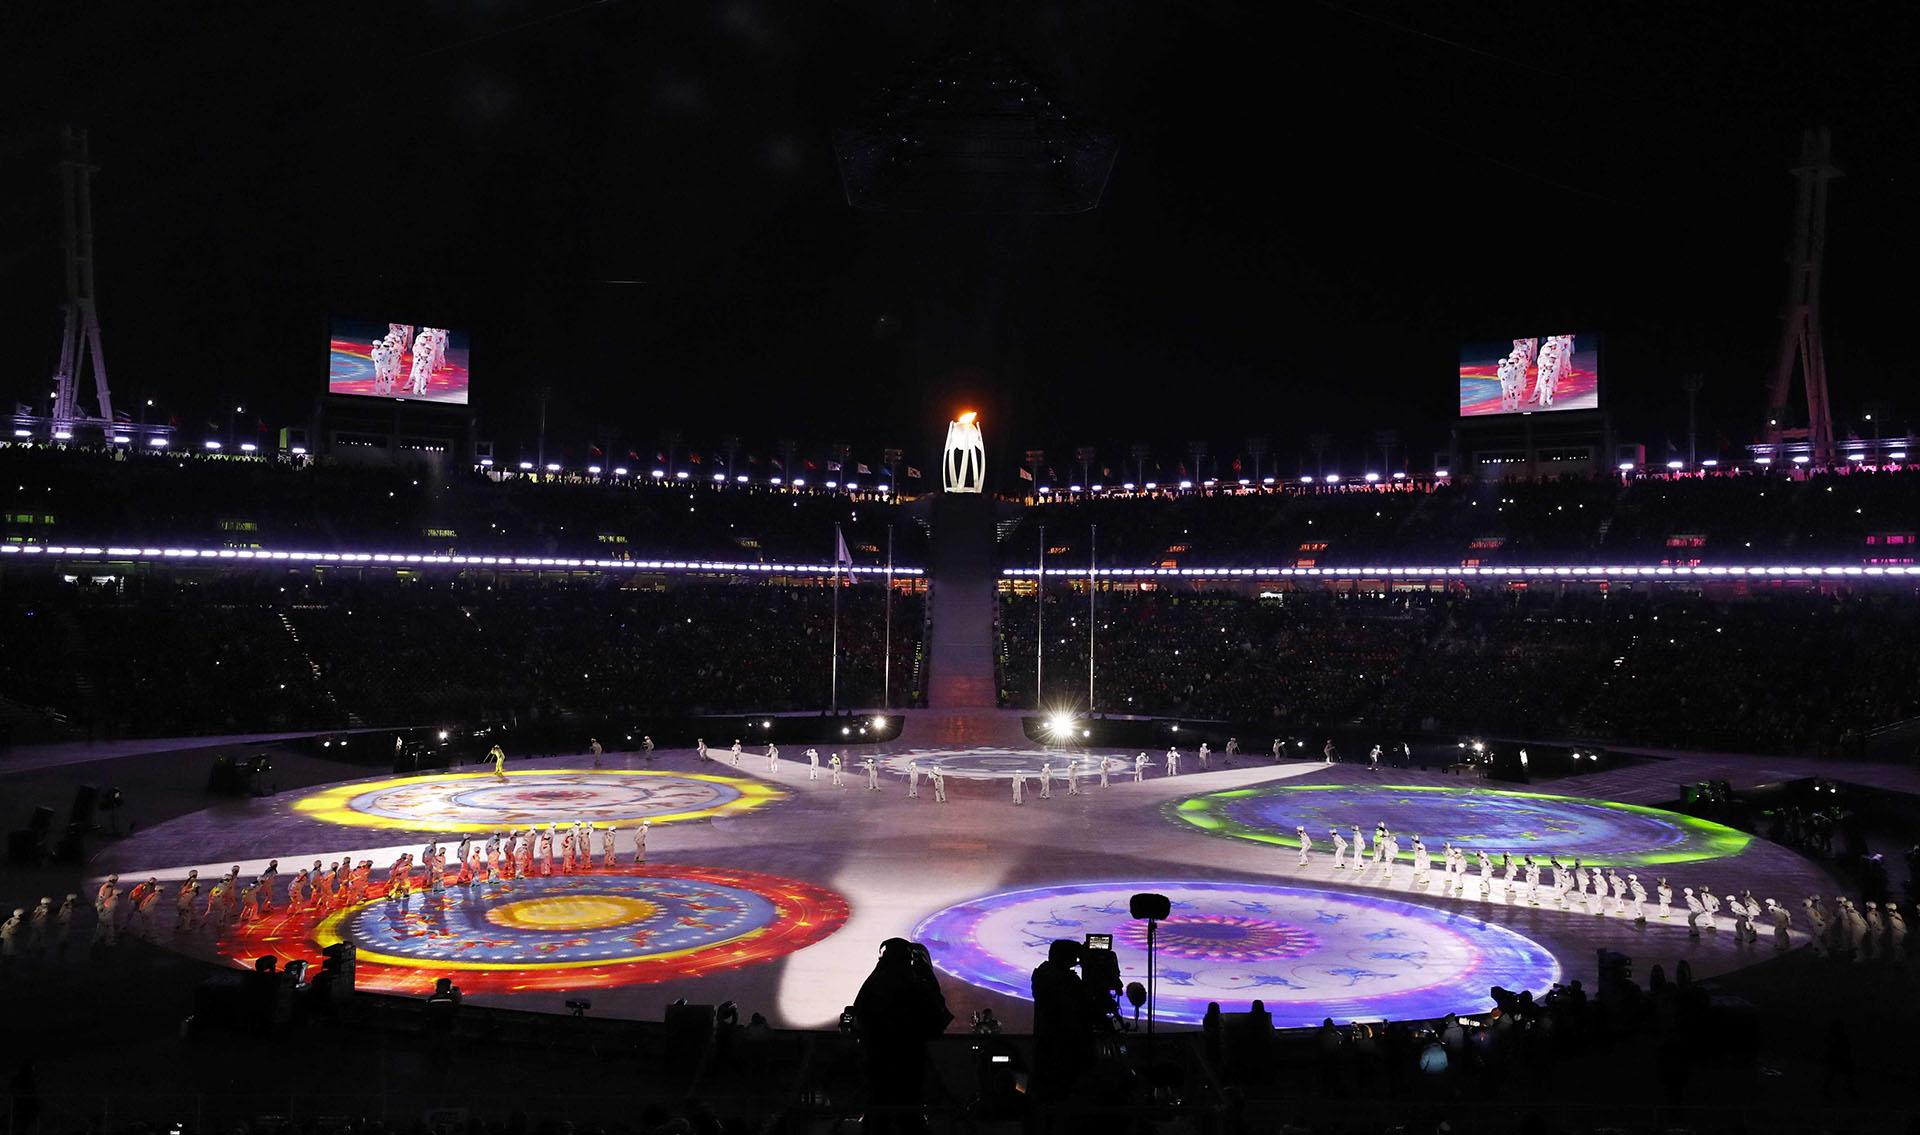 El pebetero olímpico observa la ceremonia